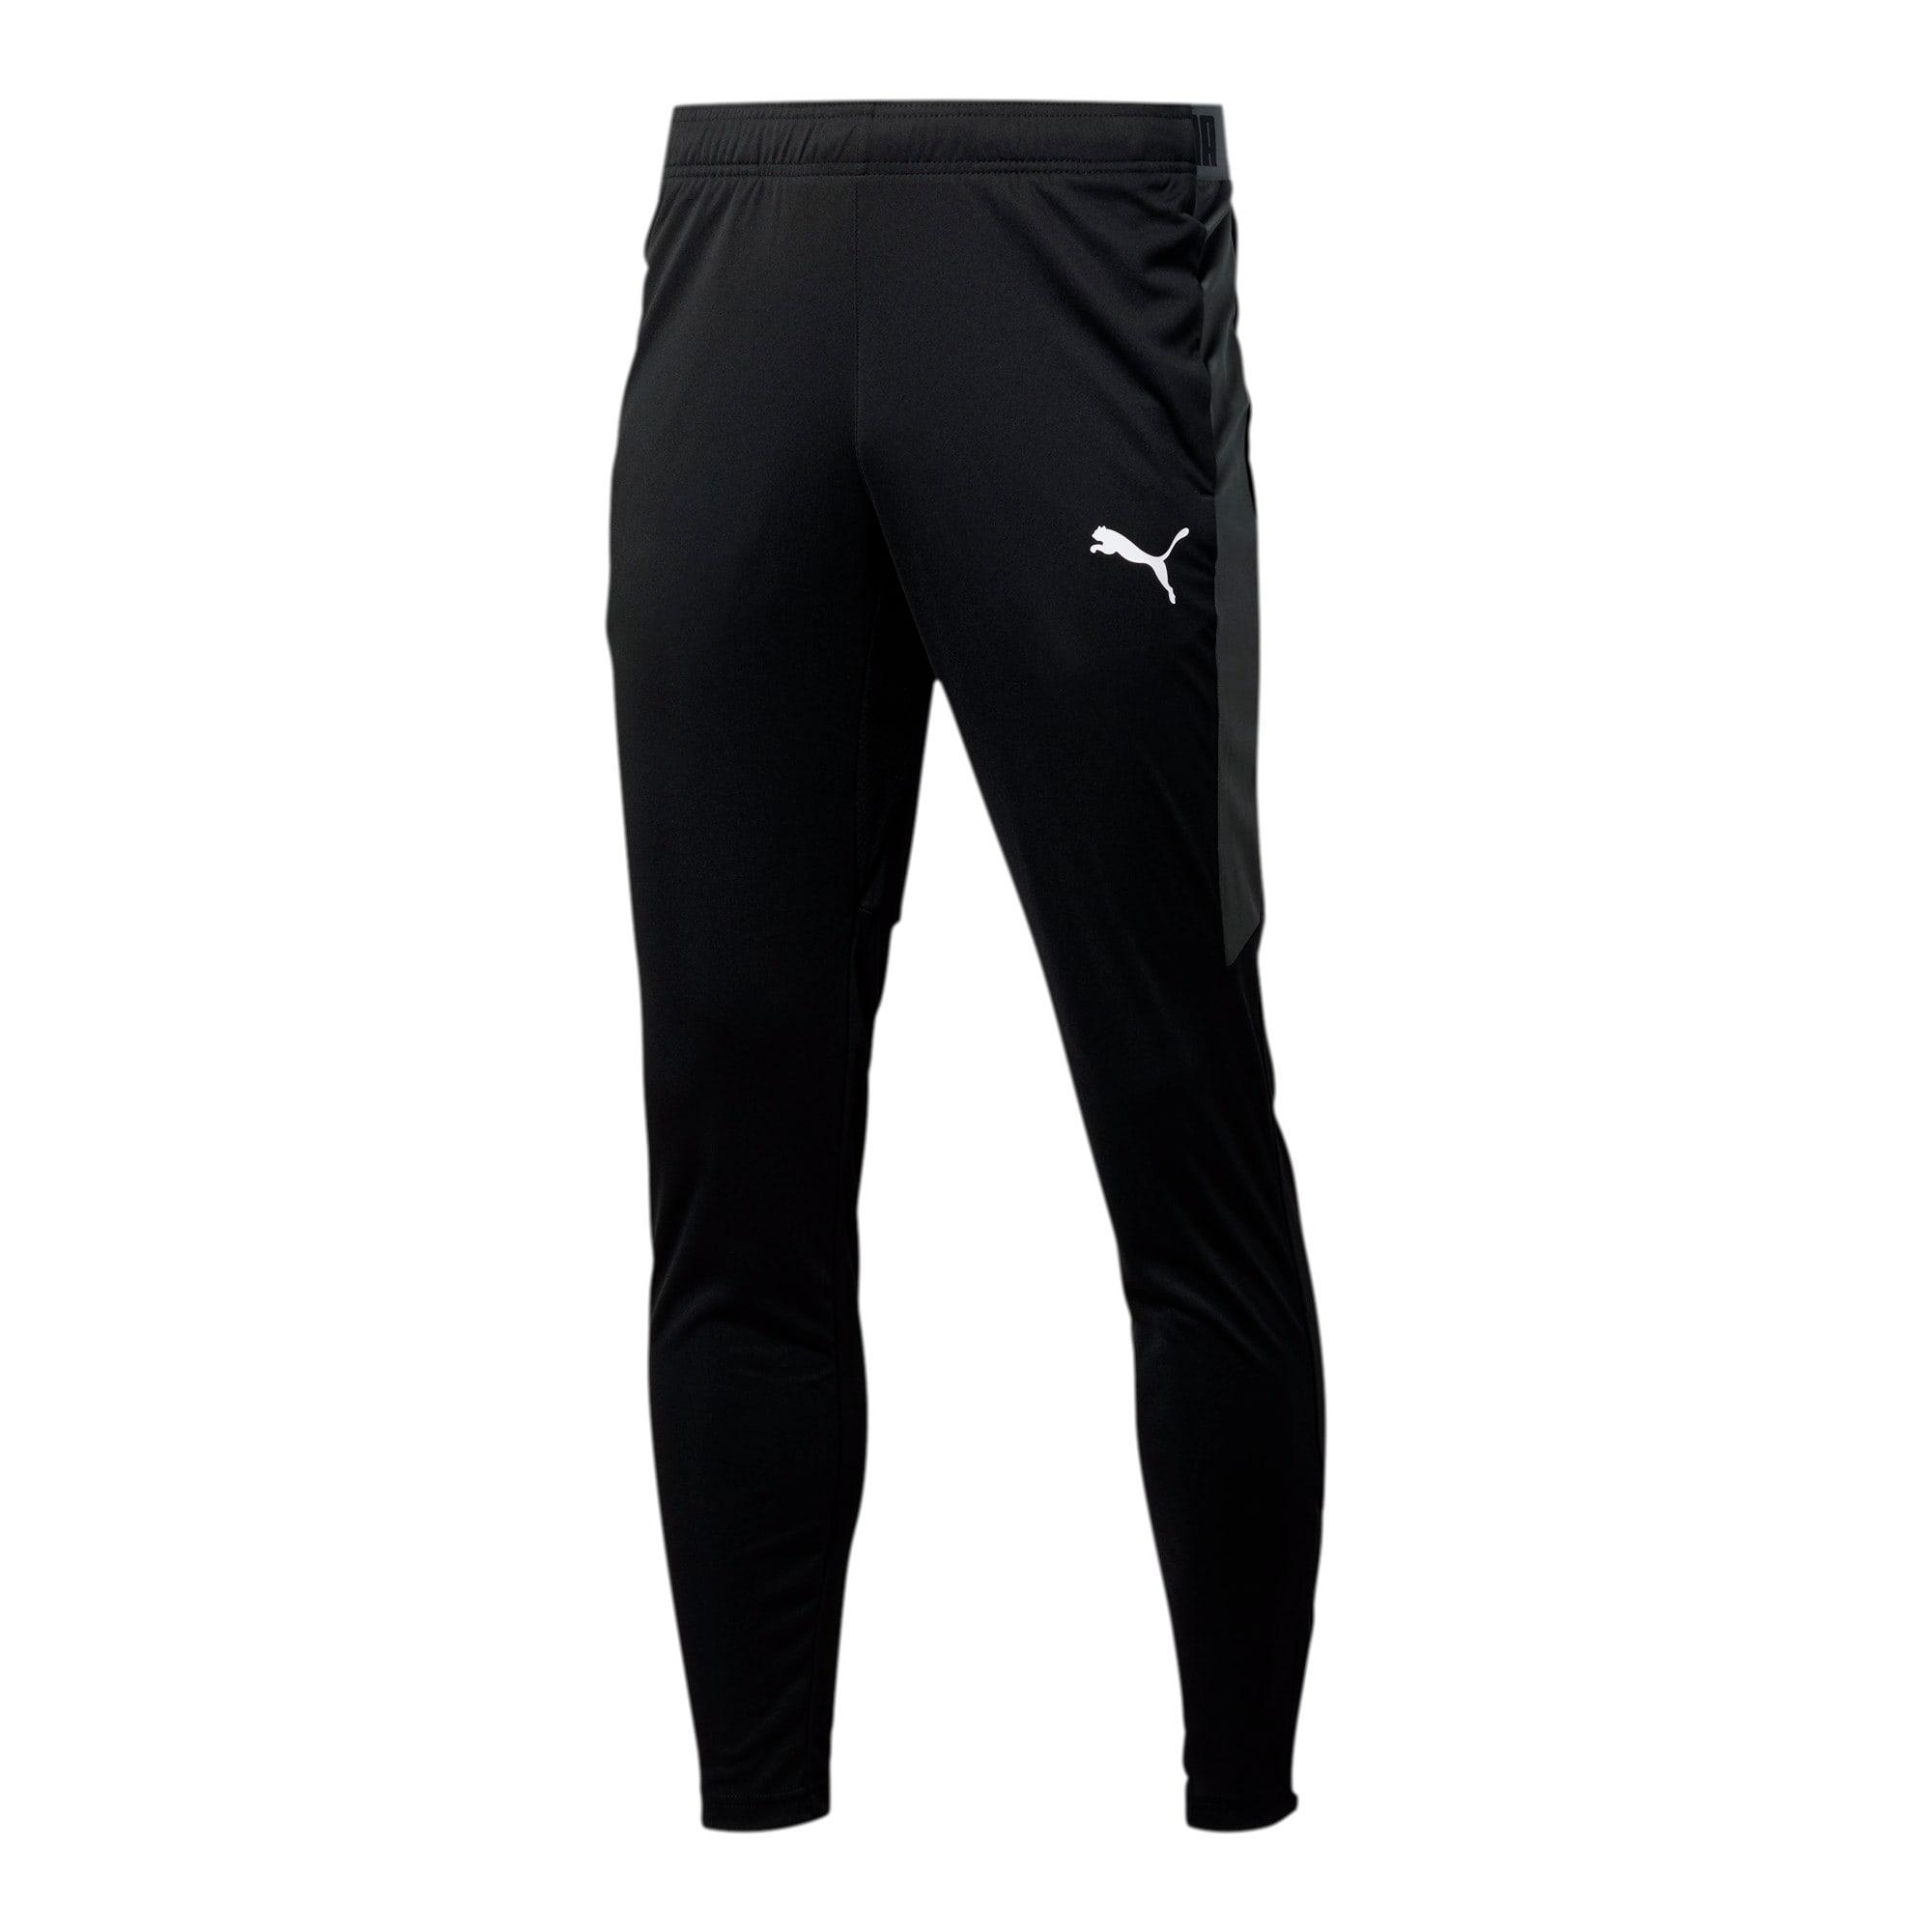 Thumbnail 4 of Men's Speed Pants, Puma Black-Asphalt, medium